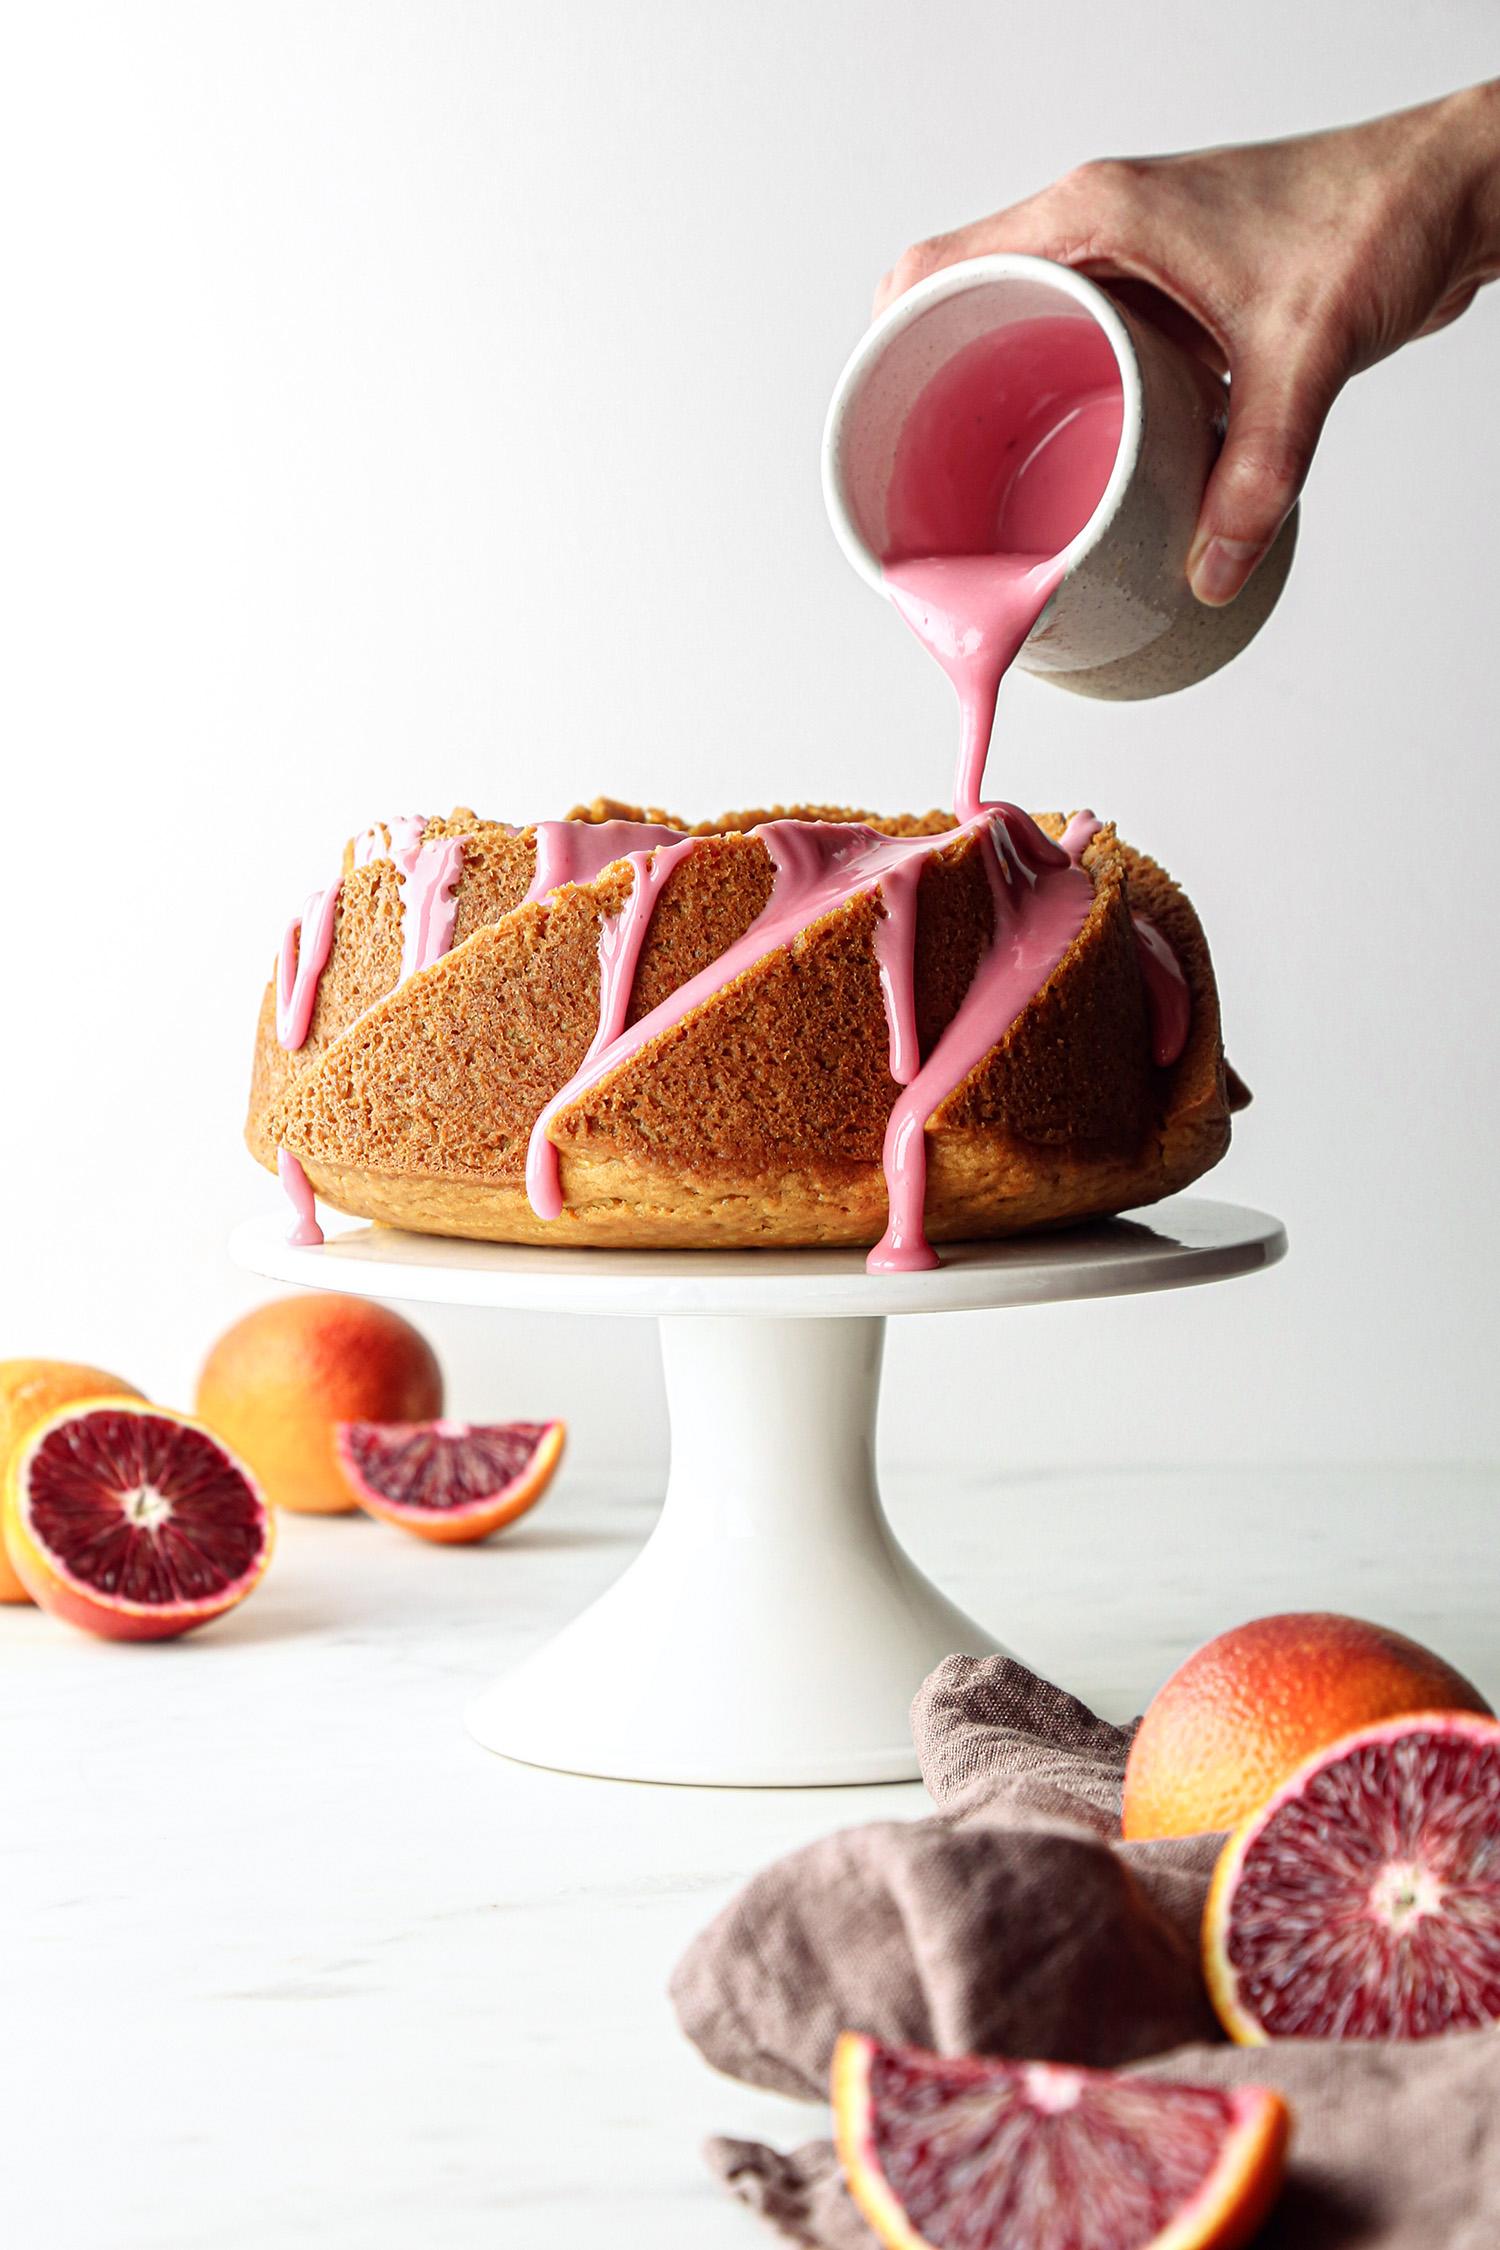 Blood Orange Bundt Cake with Blood Orange Glaze